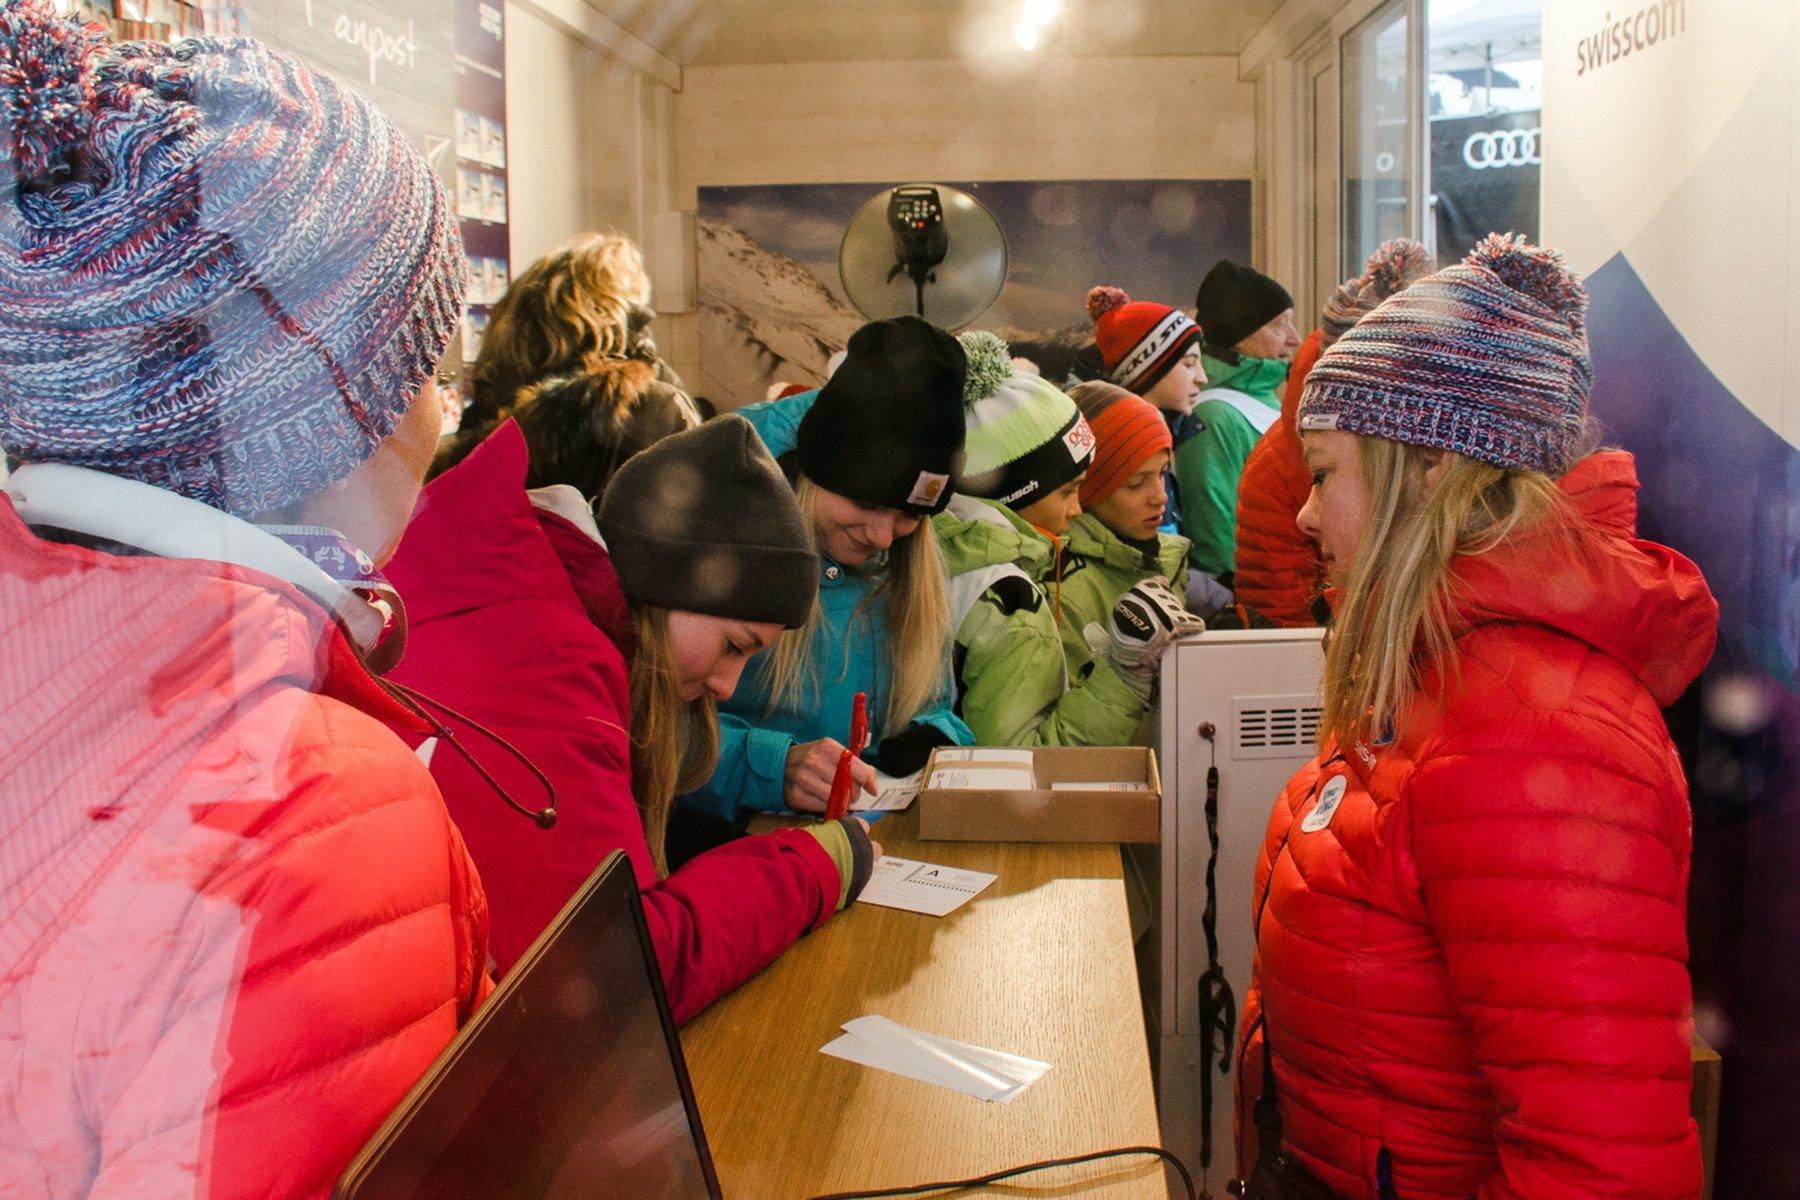 Fotobox-Swisscom-Skiweltcup-05